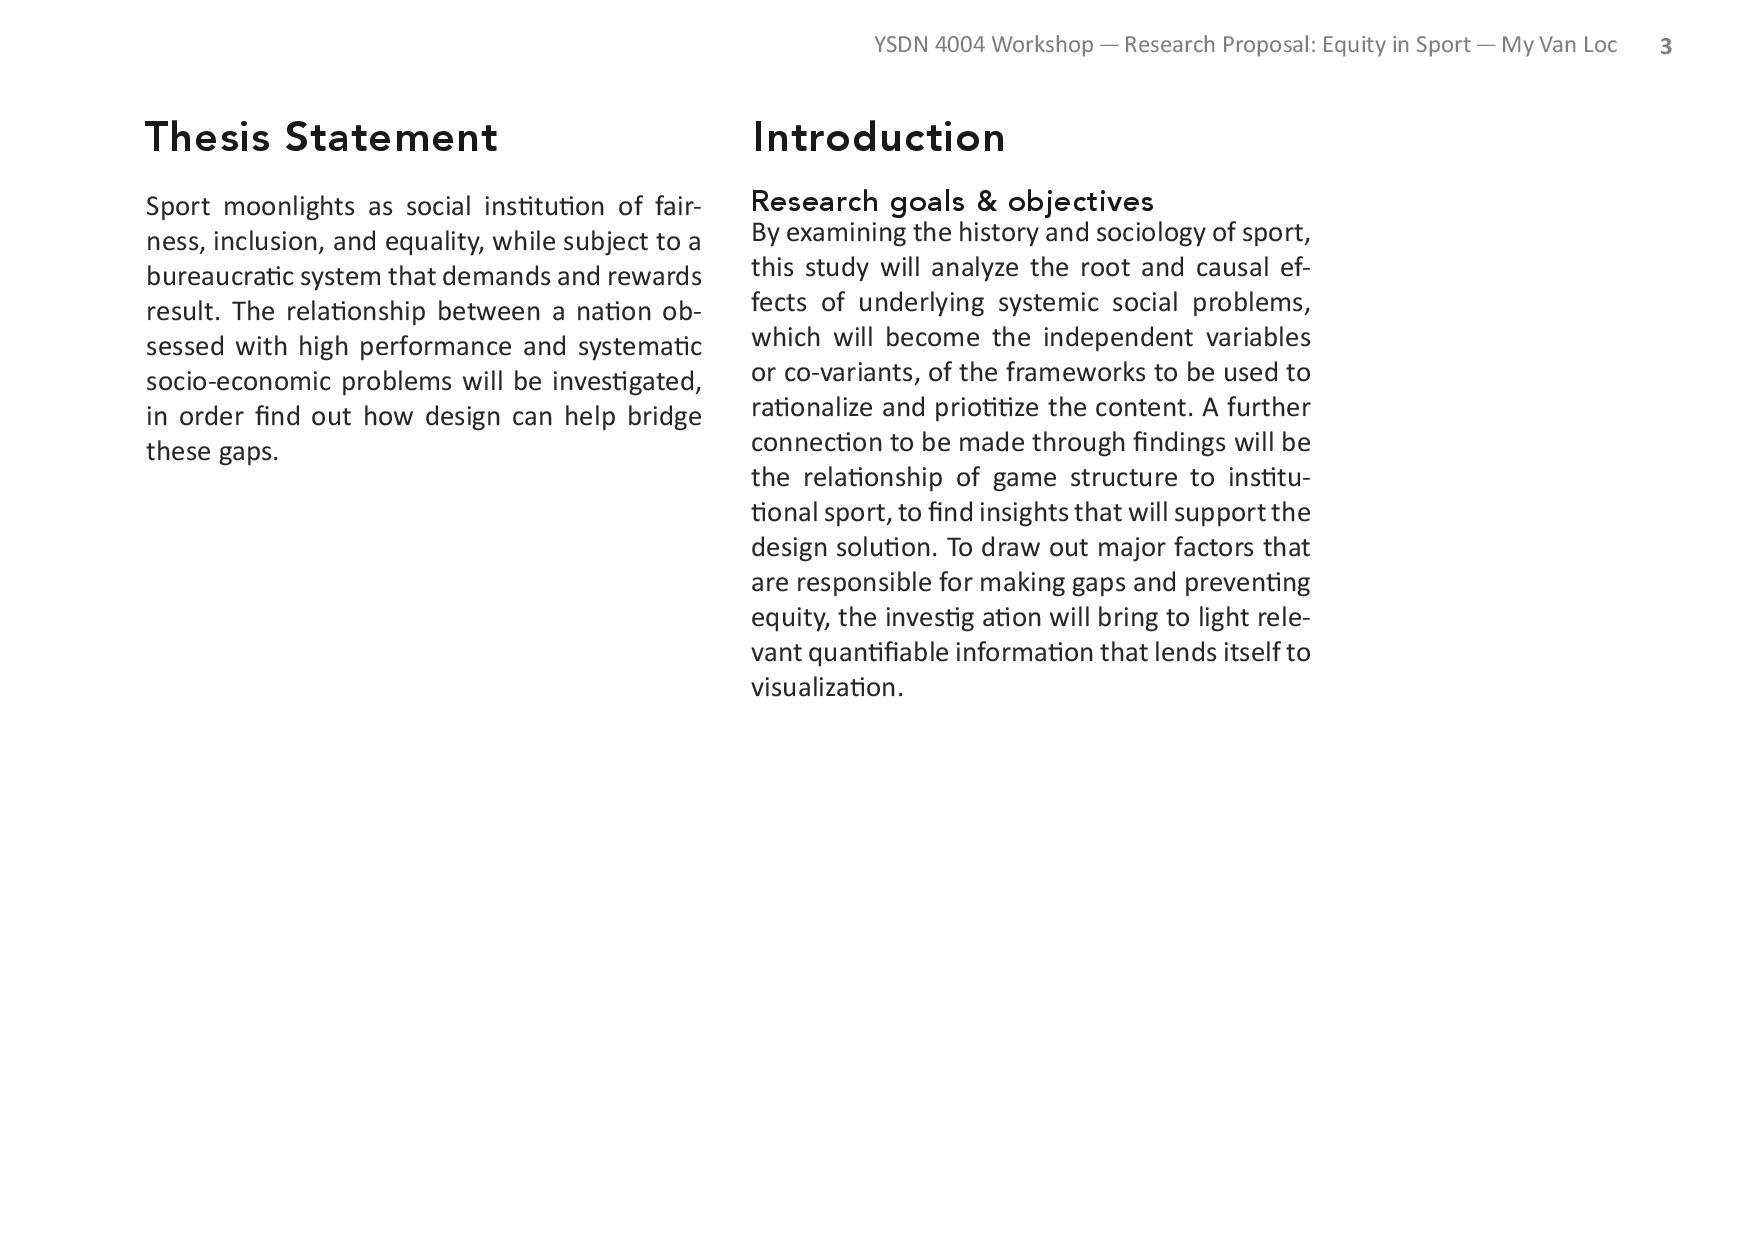 LocMy_ysdn4004_pr1_proposal-page-003.jpg